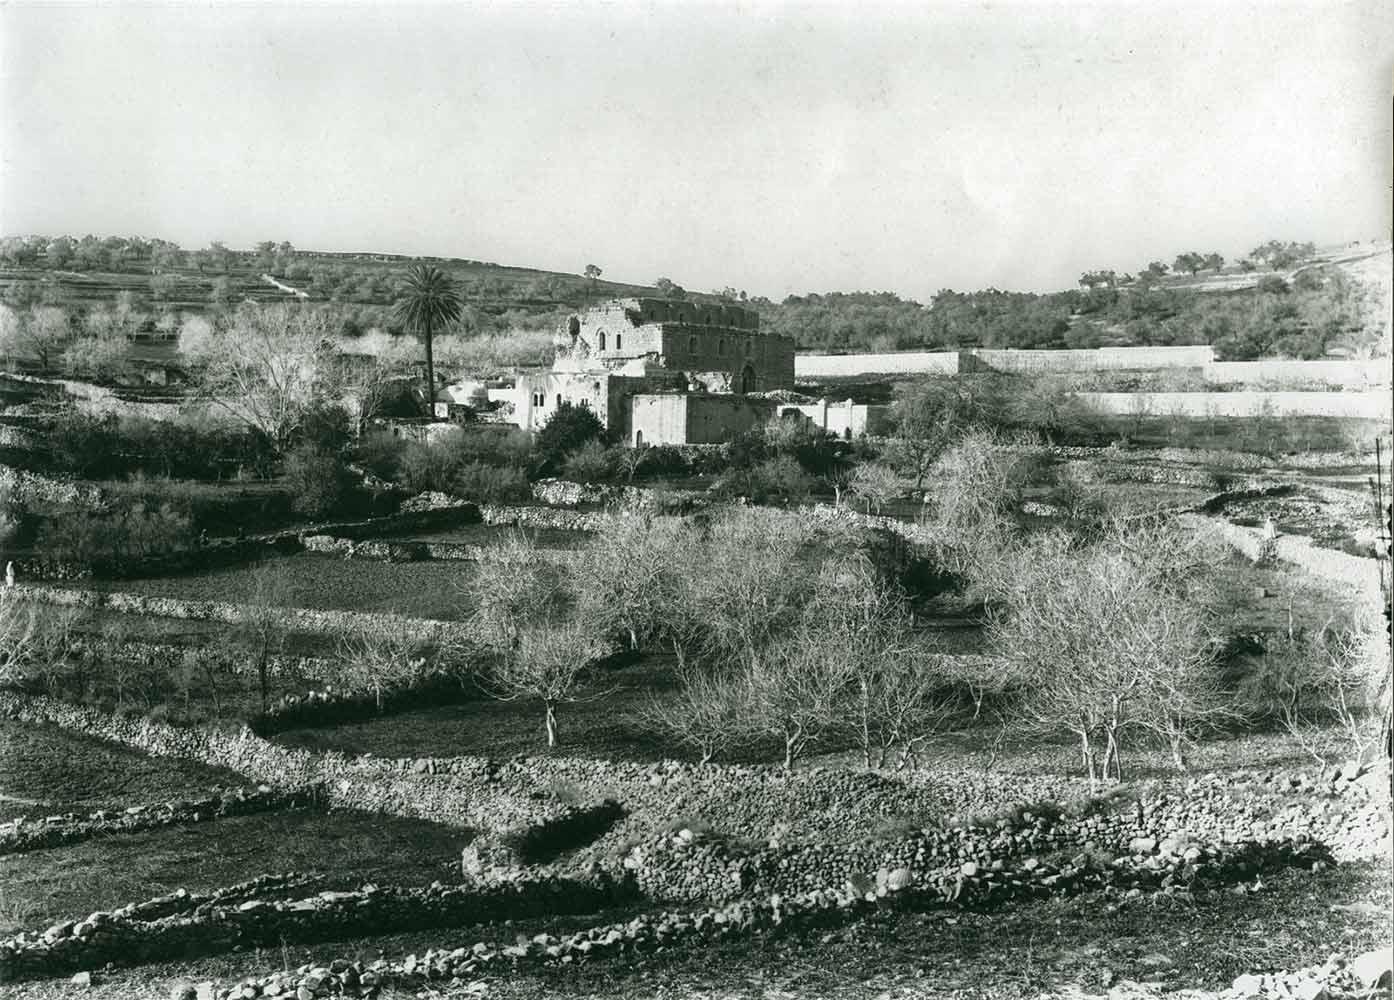 monastere-abu-gosh-1900